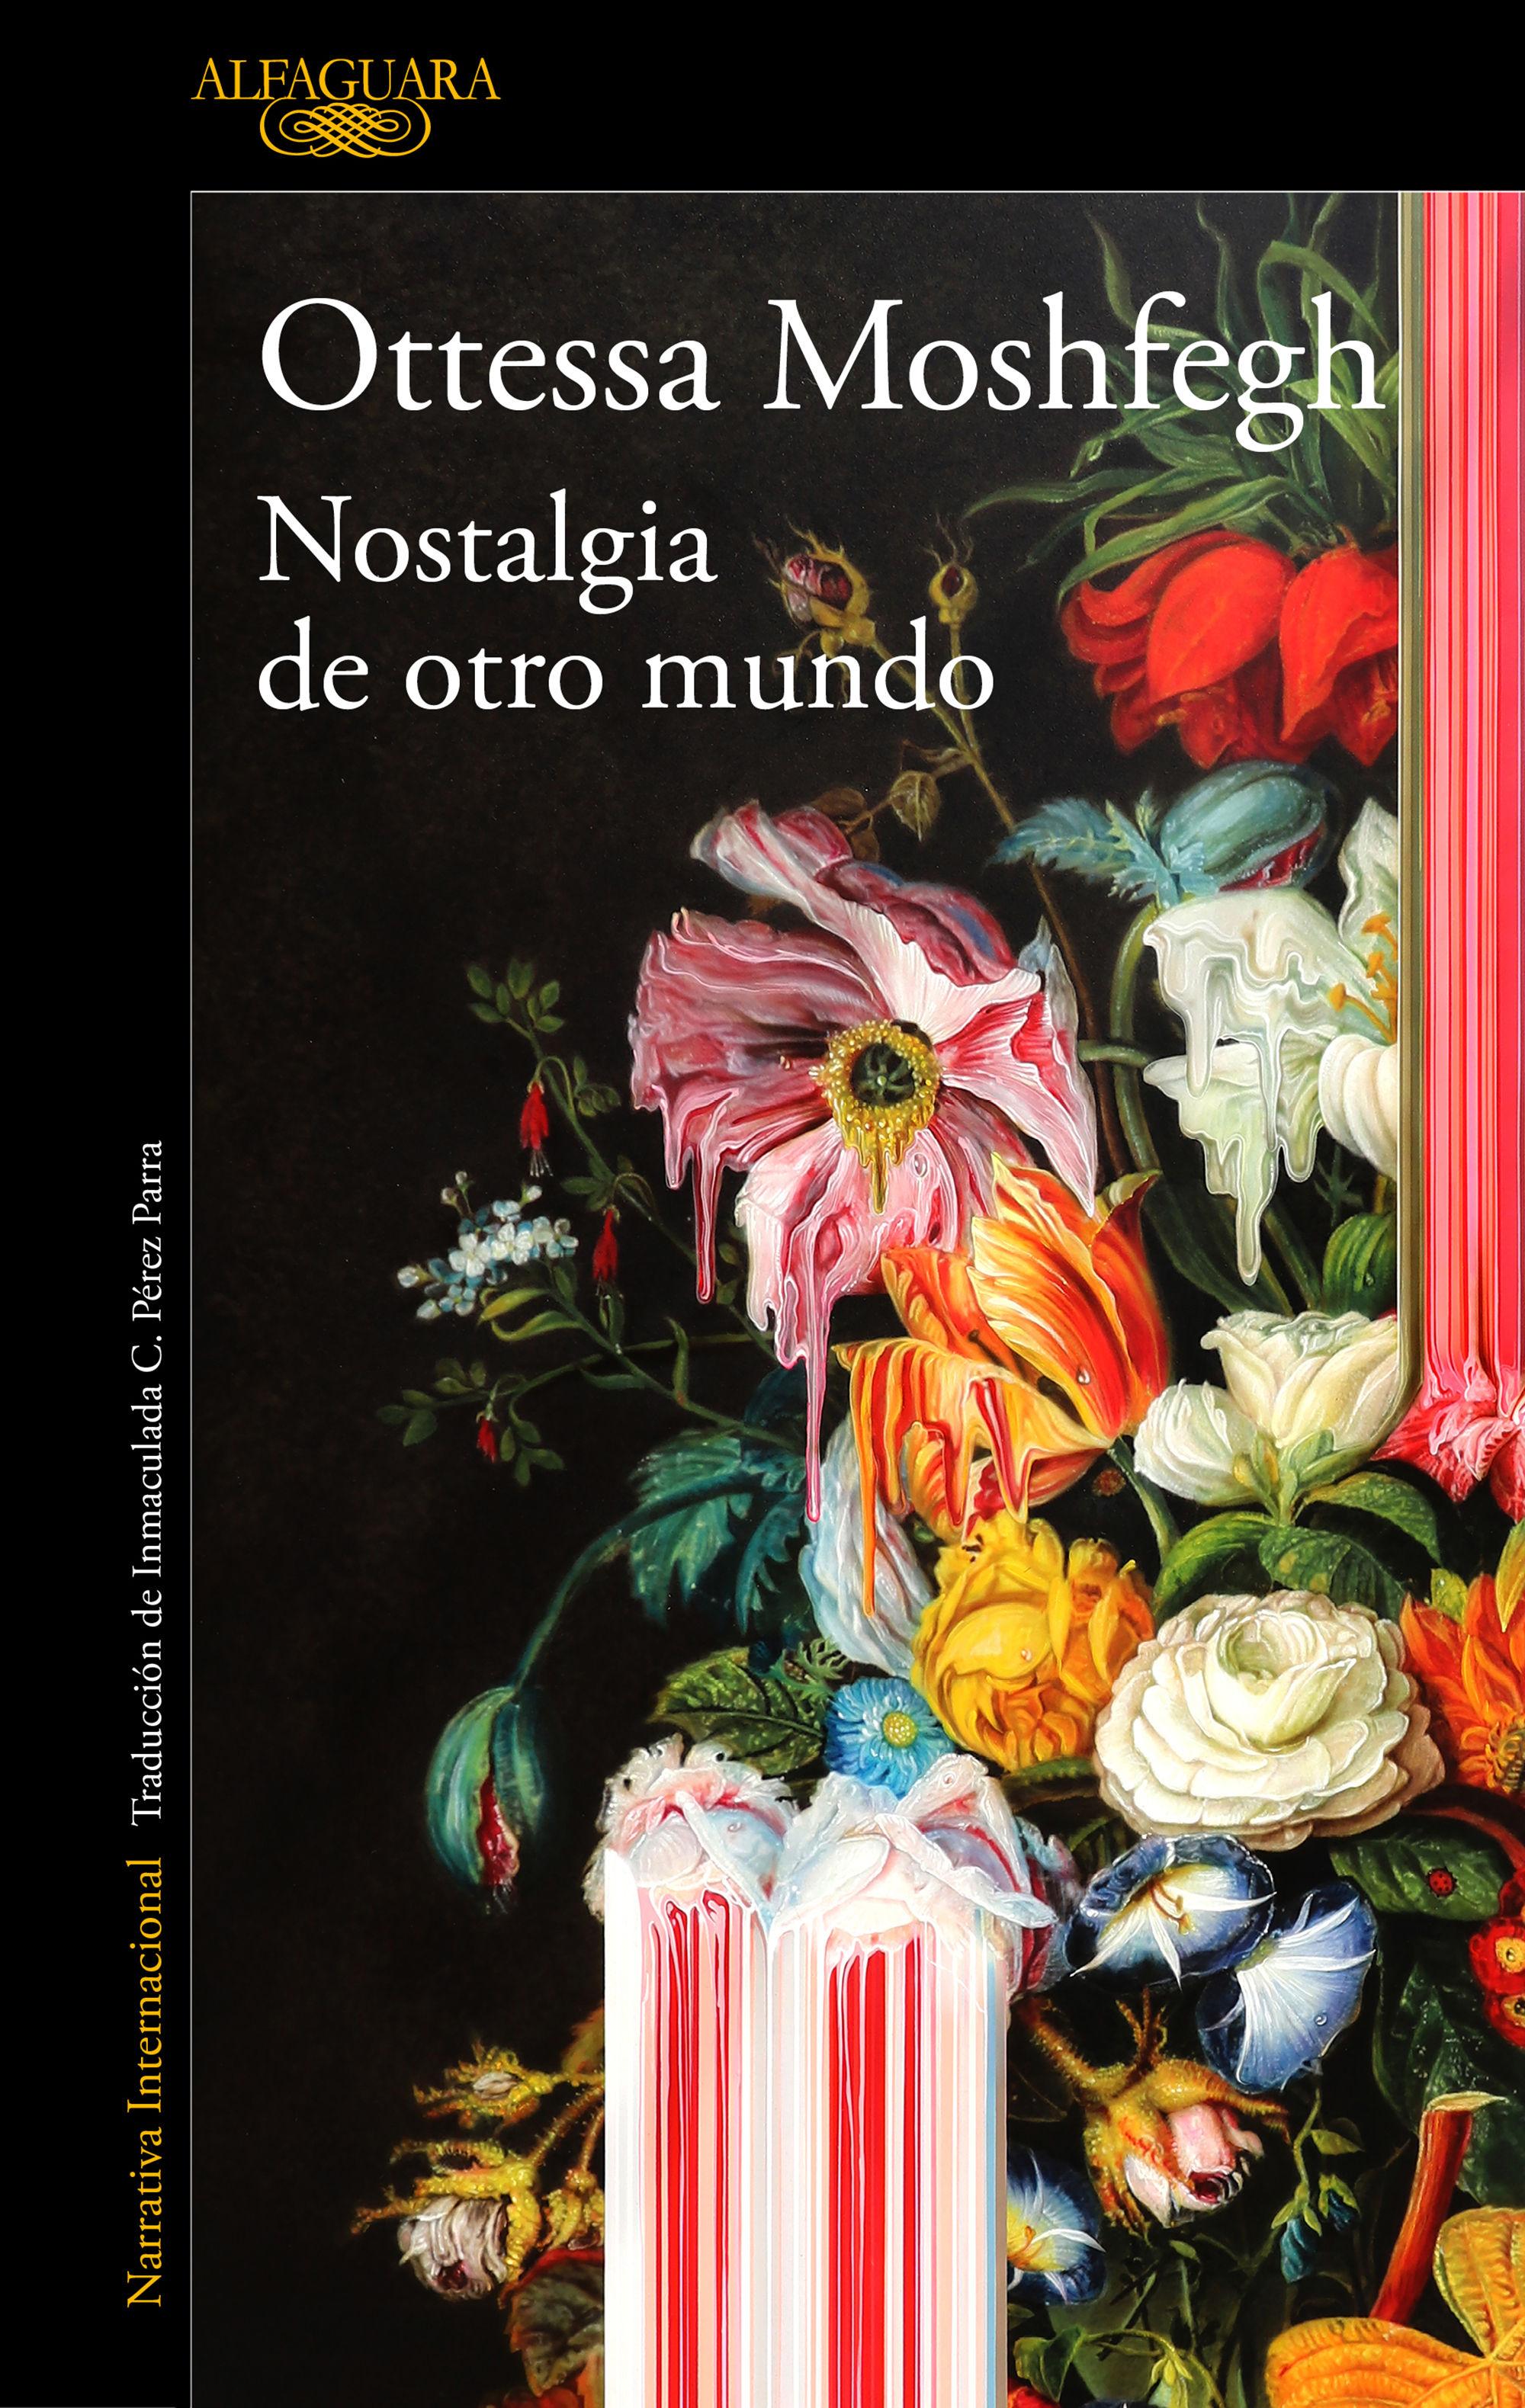 NOSTALGIA DE OTRO MUNDO